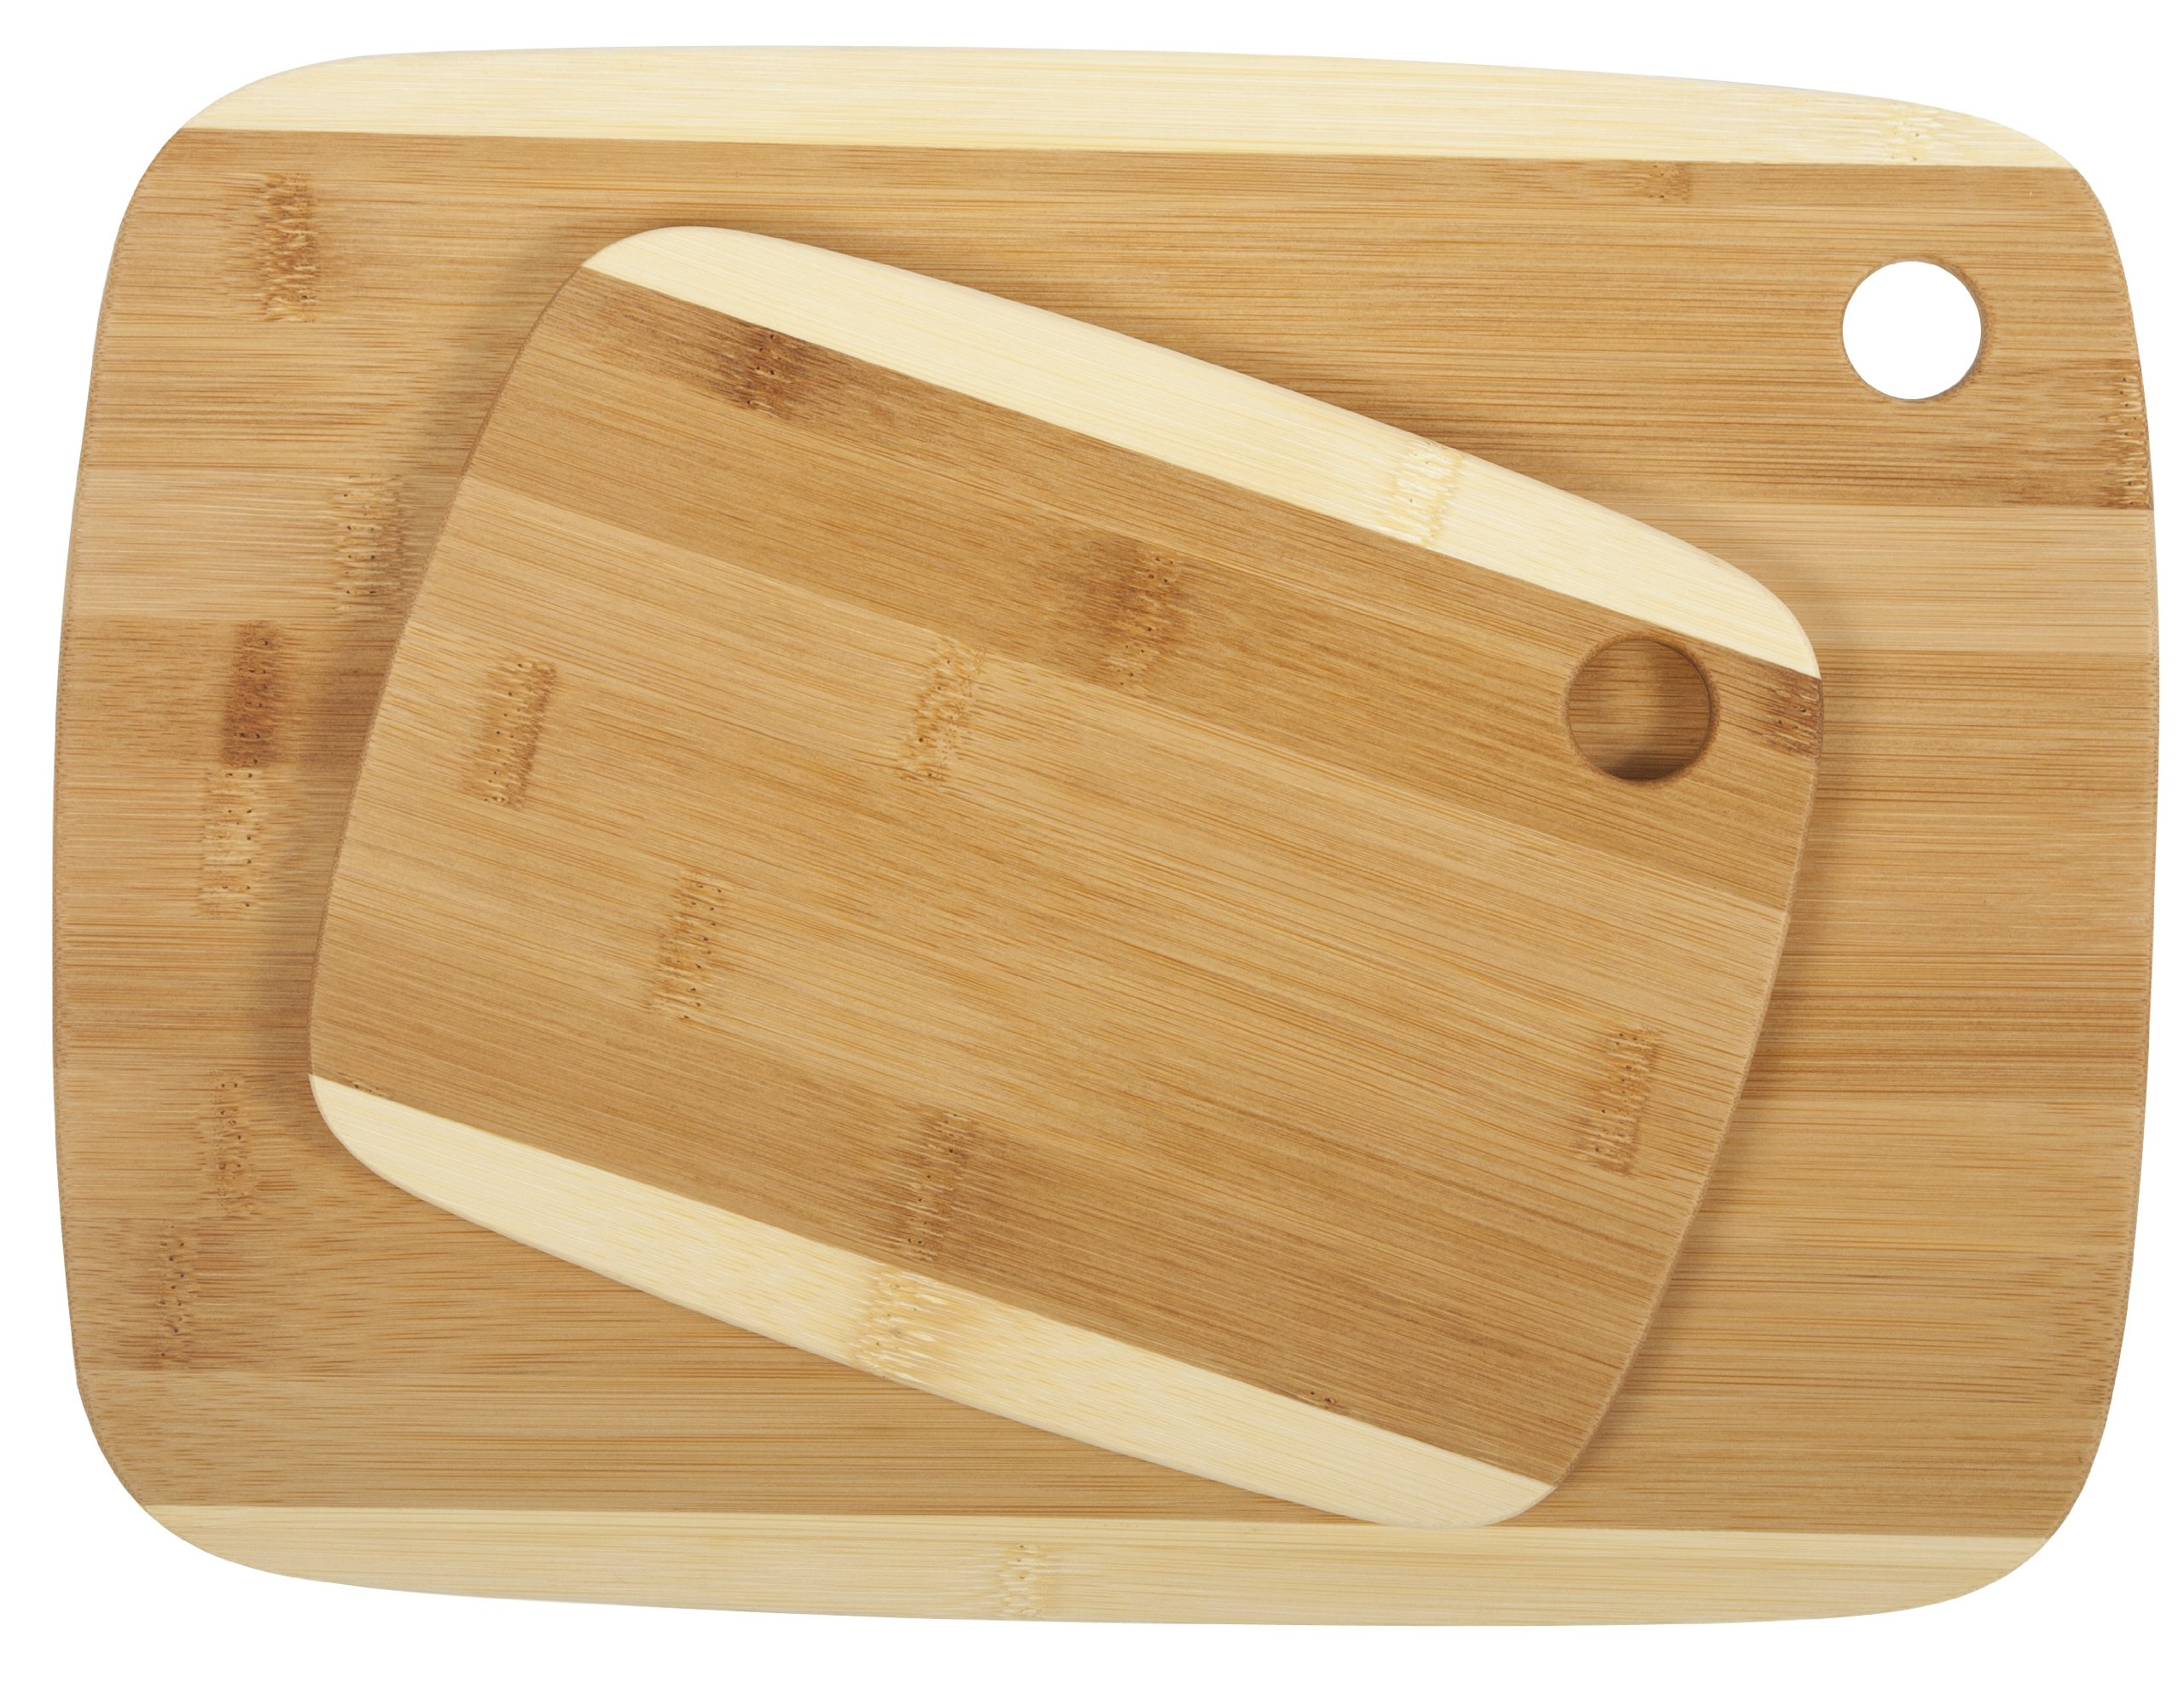 Core Bamboo 1004 Classic 2-Tone Board Combo Pack, Small/Medium